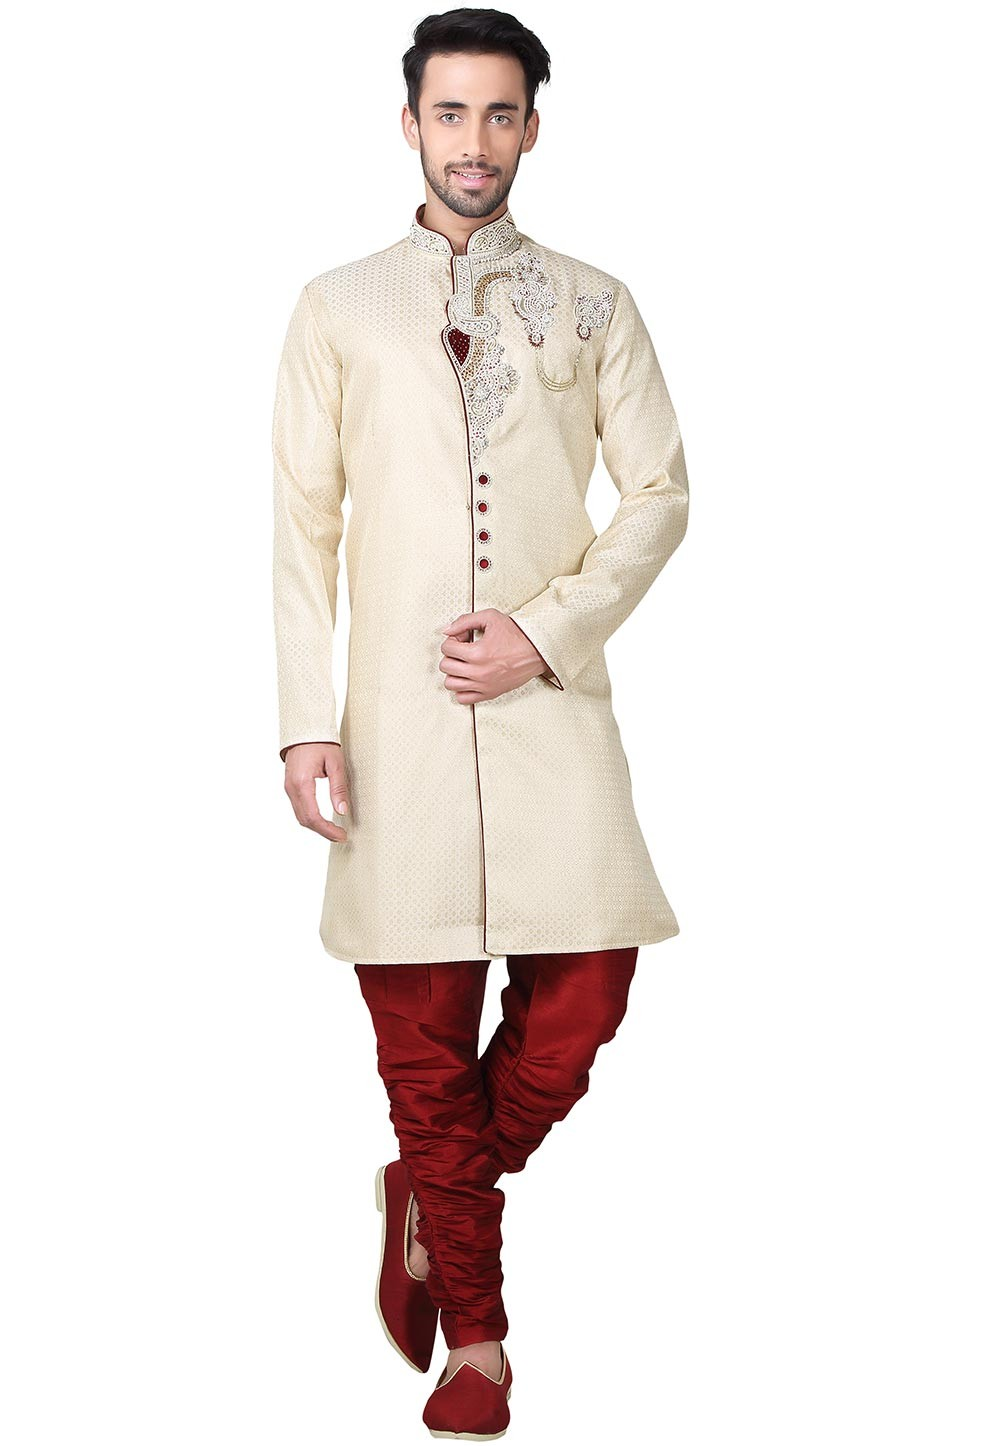 Golden Color Brocade Fabric Indian Wedding Kurta Pajama With With Hand Work.